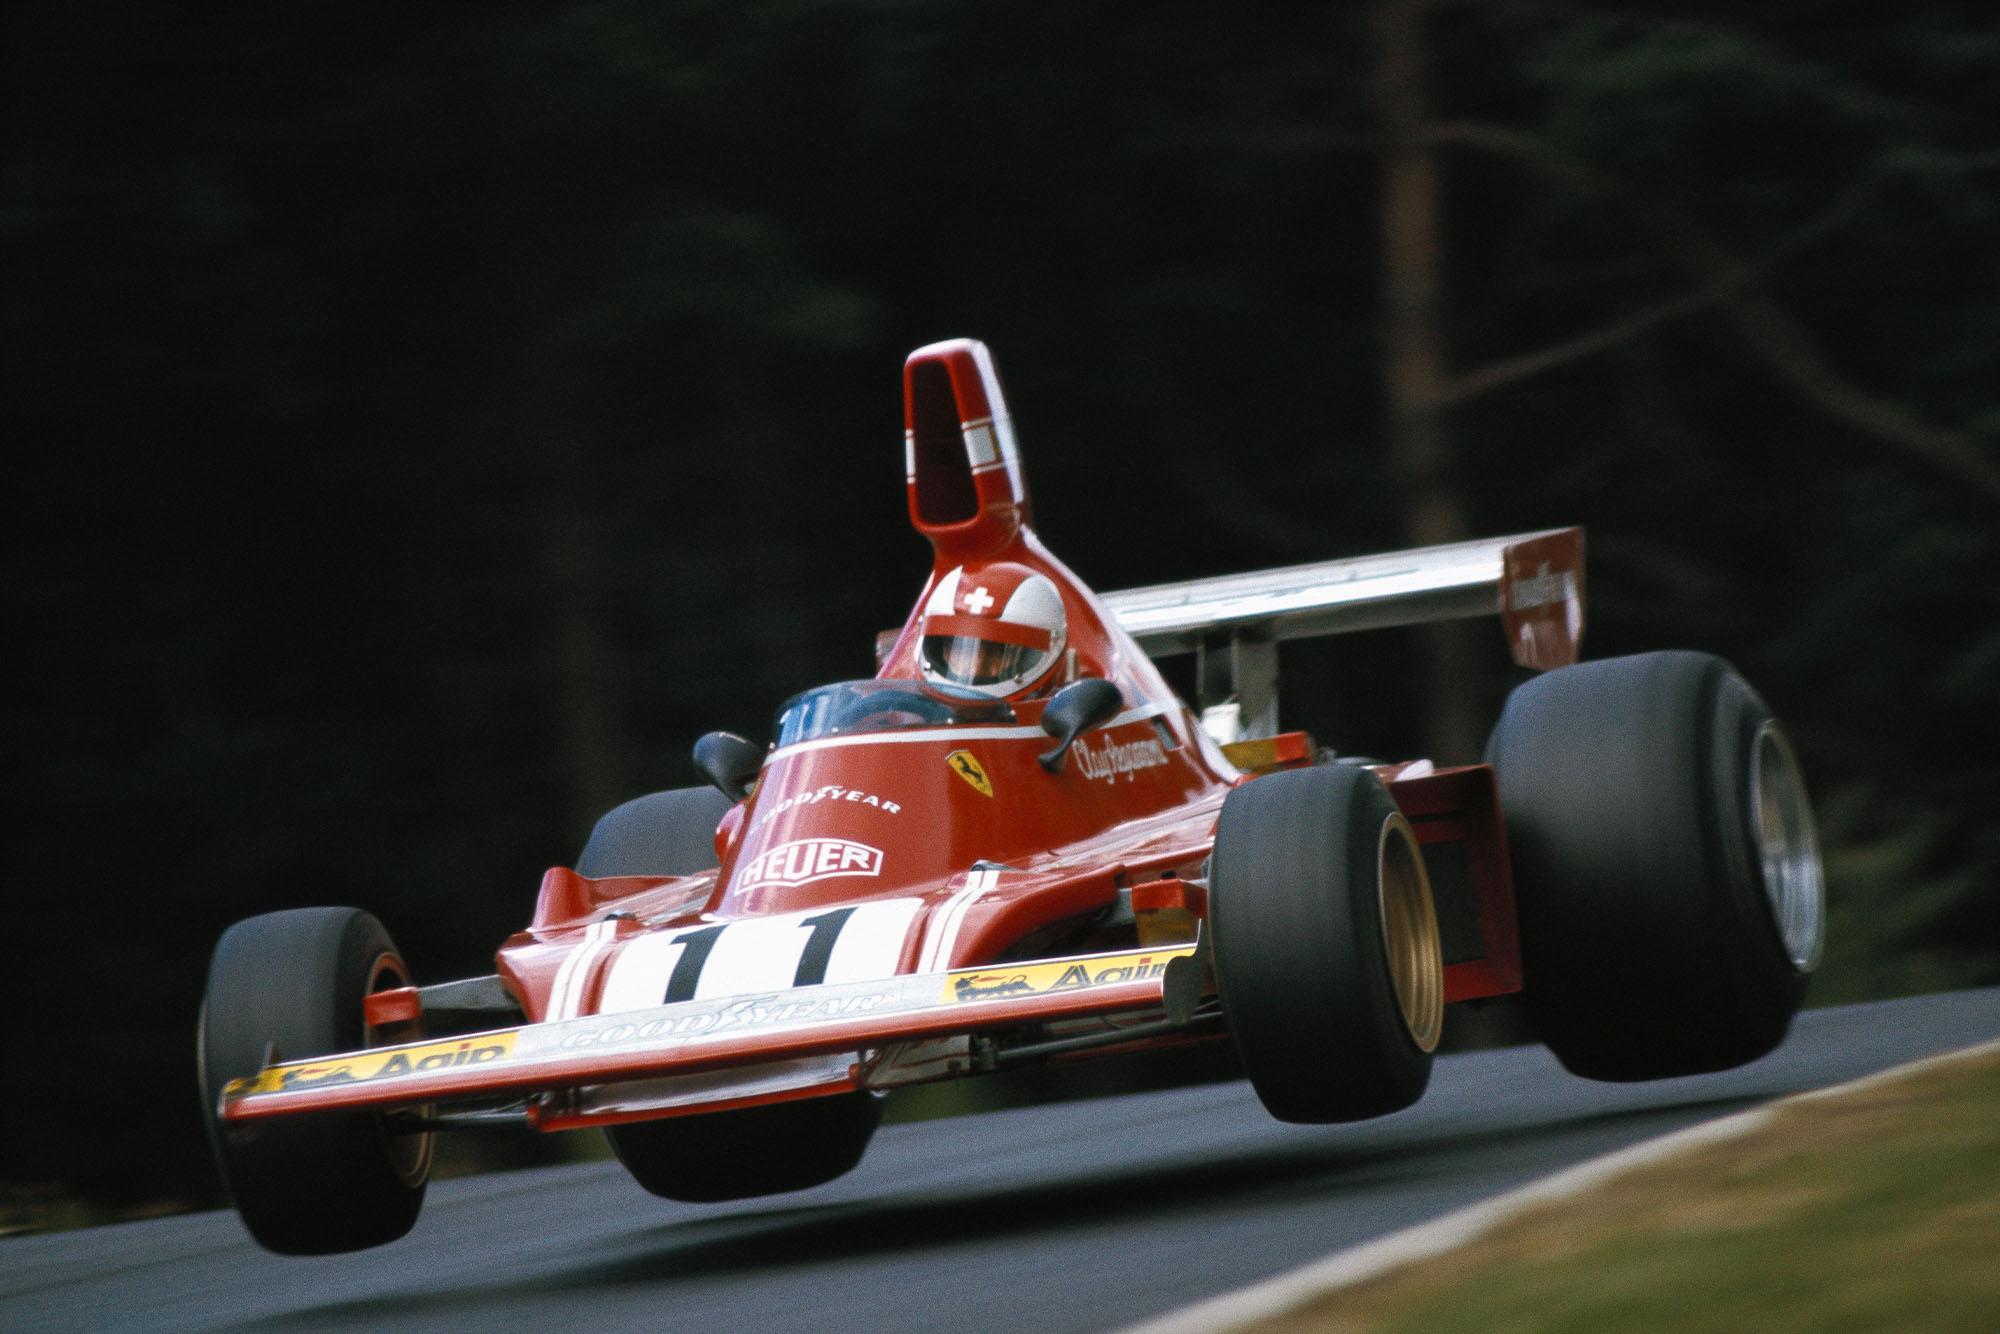 Clay Regazzoni's Ferrari takes flight at the 1974 German Grand Prix